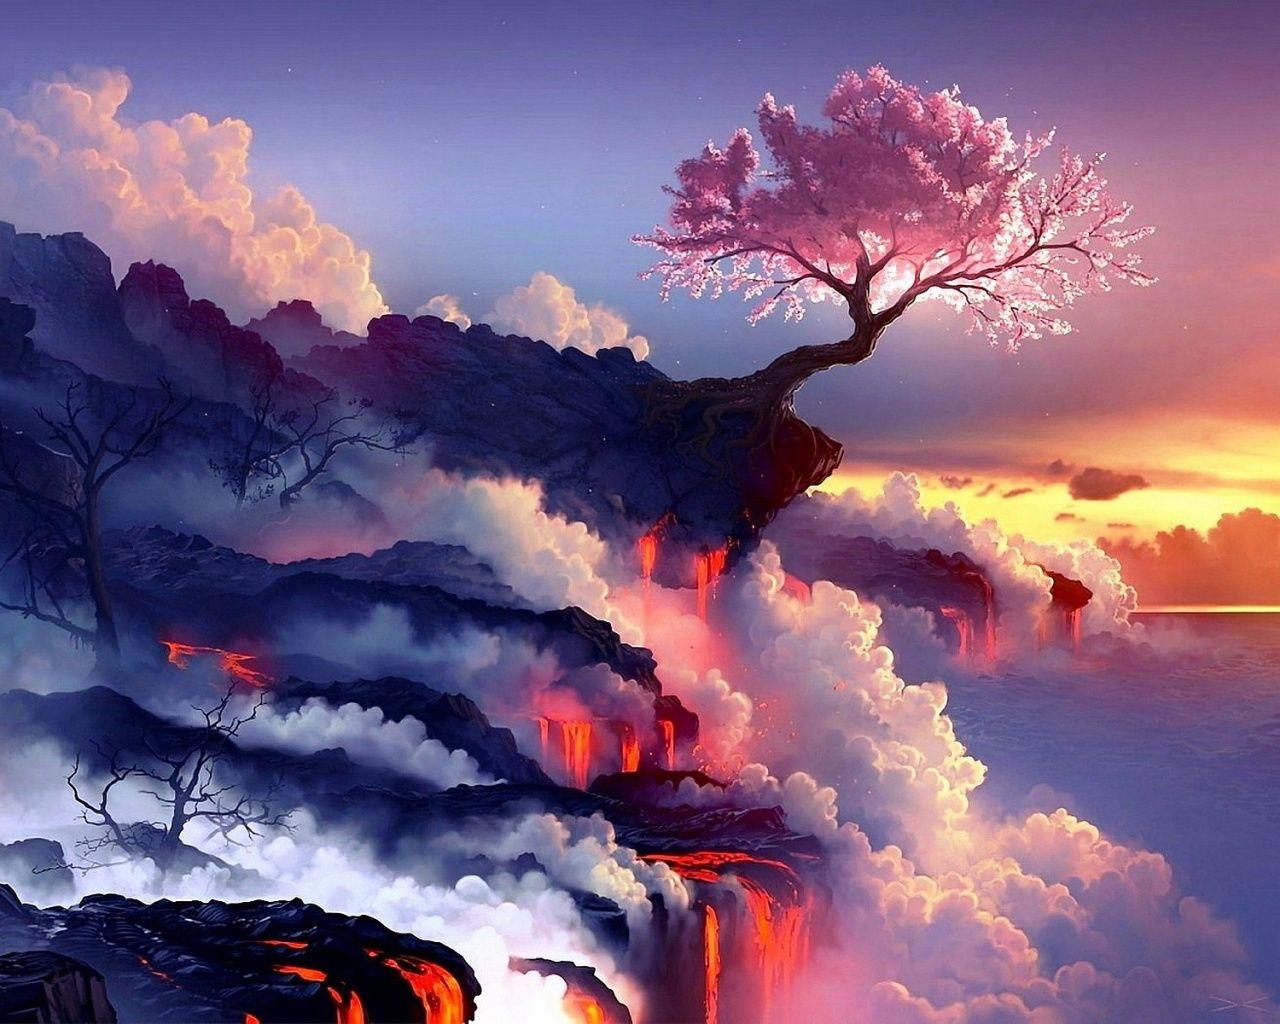 Cherry Tree Volcano Wallpaper In 1280x1024 Landscape Wallpaper Fantasy Landscape Volcano Wallpaper